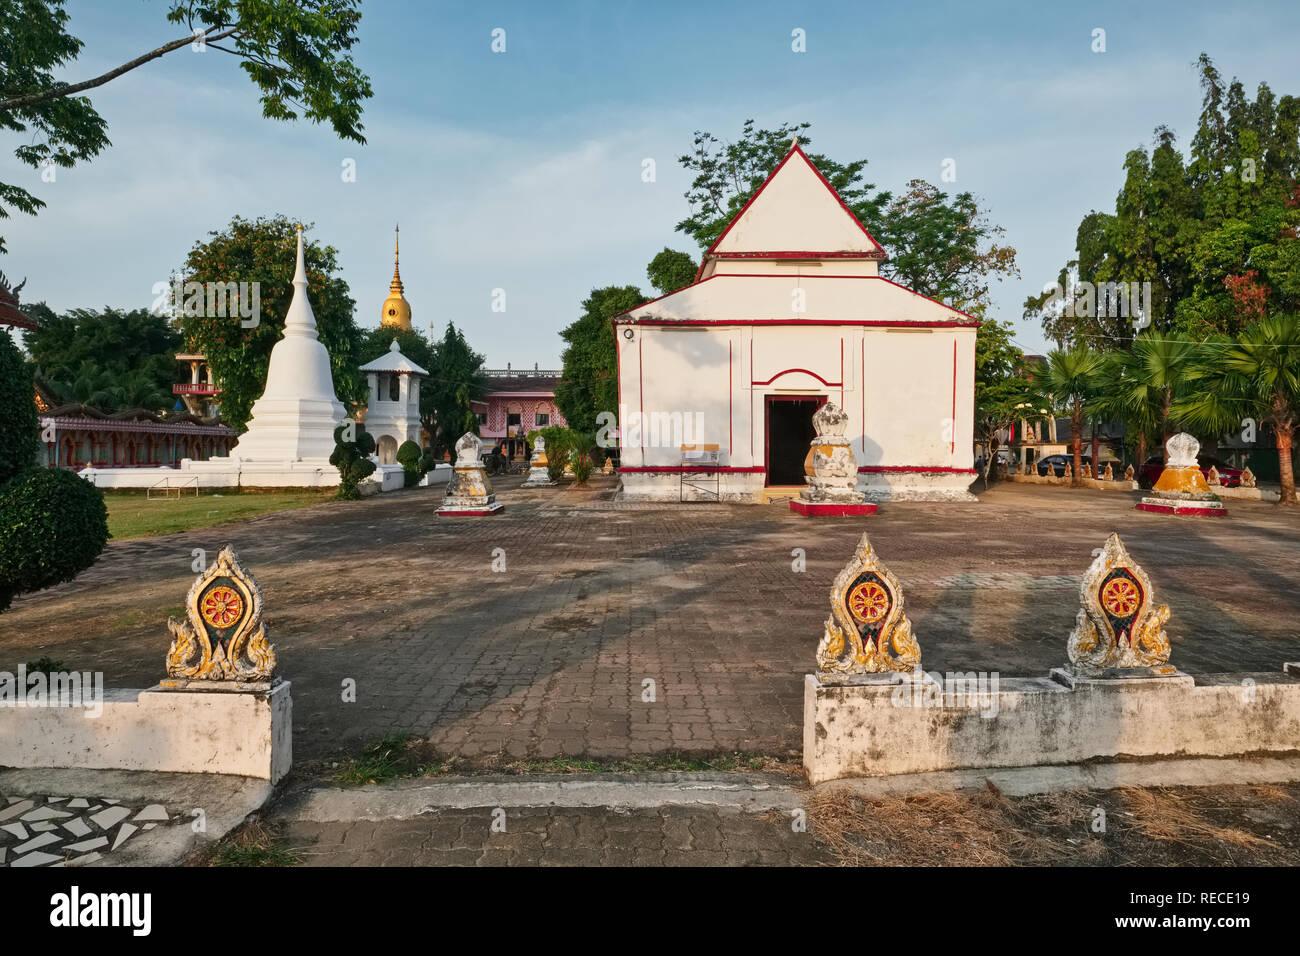 El viejo, históricamente imprtant Bot o ubosot (ordenación hall; derecha) de Wat Phra Nang Sang, Thalang, Phuket, Tailandia; frontal: Sema o frontera piedras Foto de stock